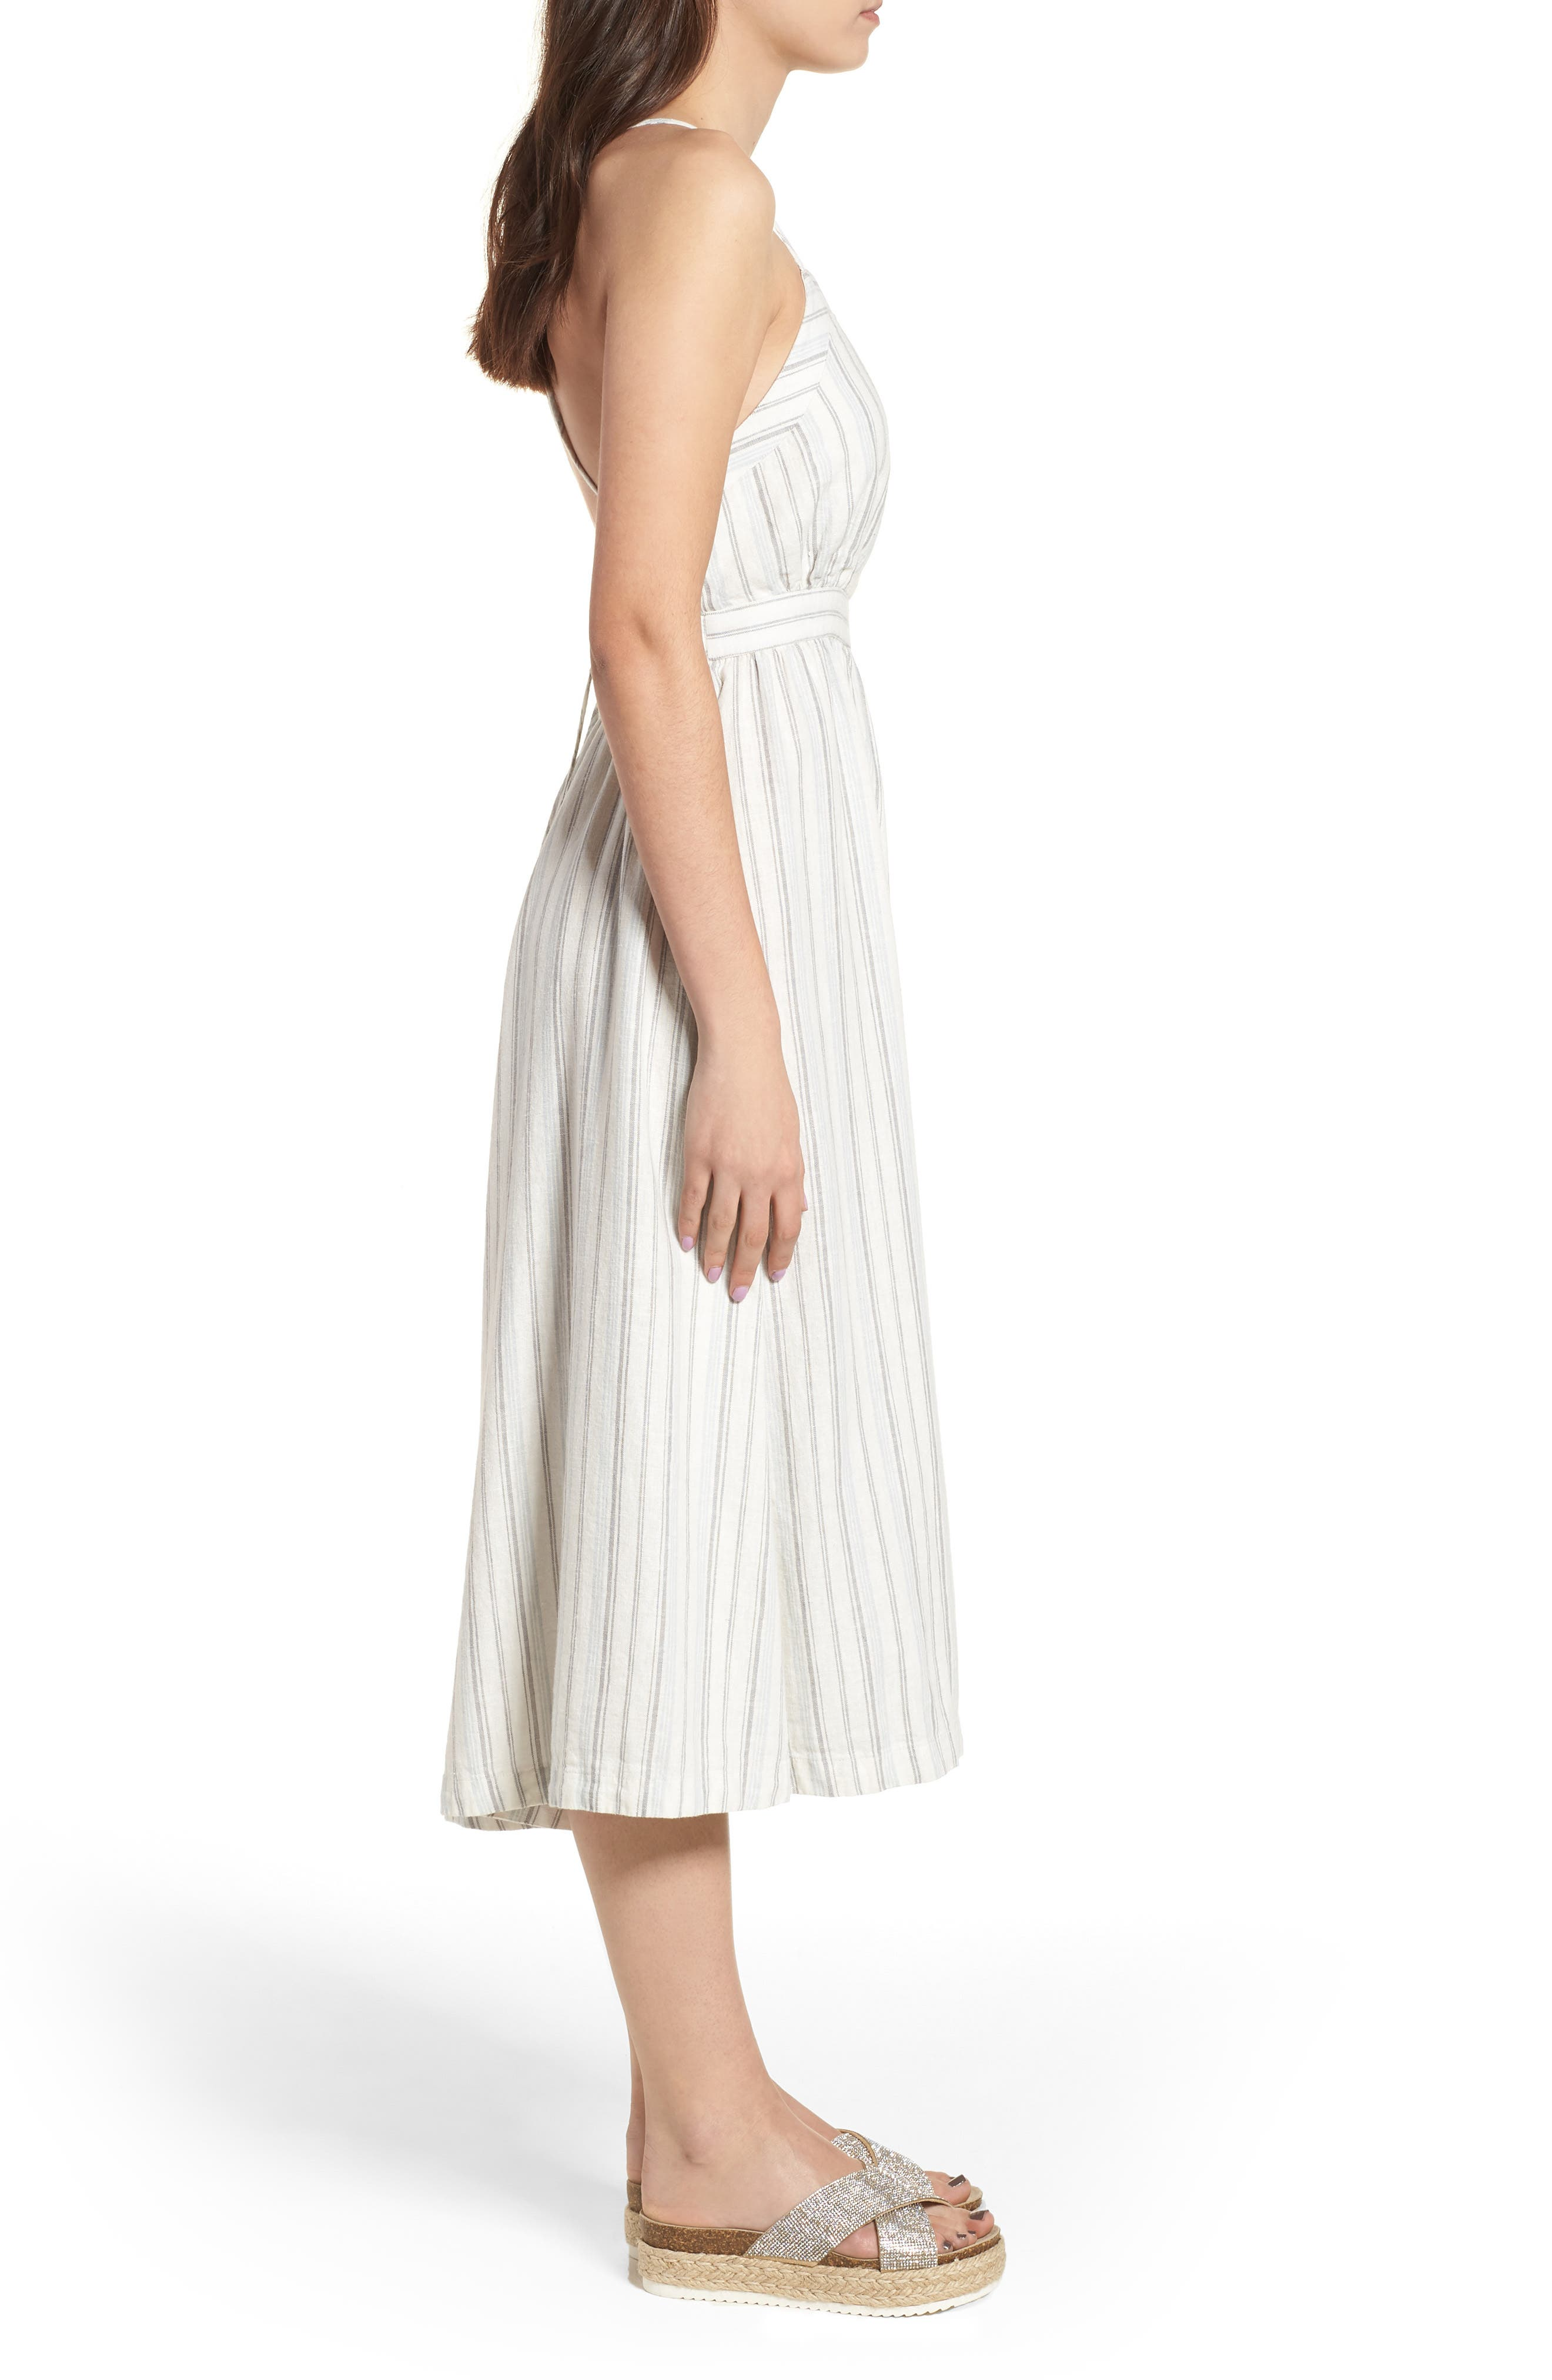 Stripe Apron Dress,                             Alternate thumbnail 3, color,                             Ivory Verigated Stripe